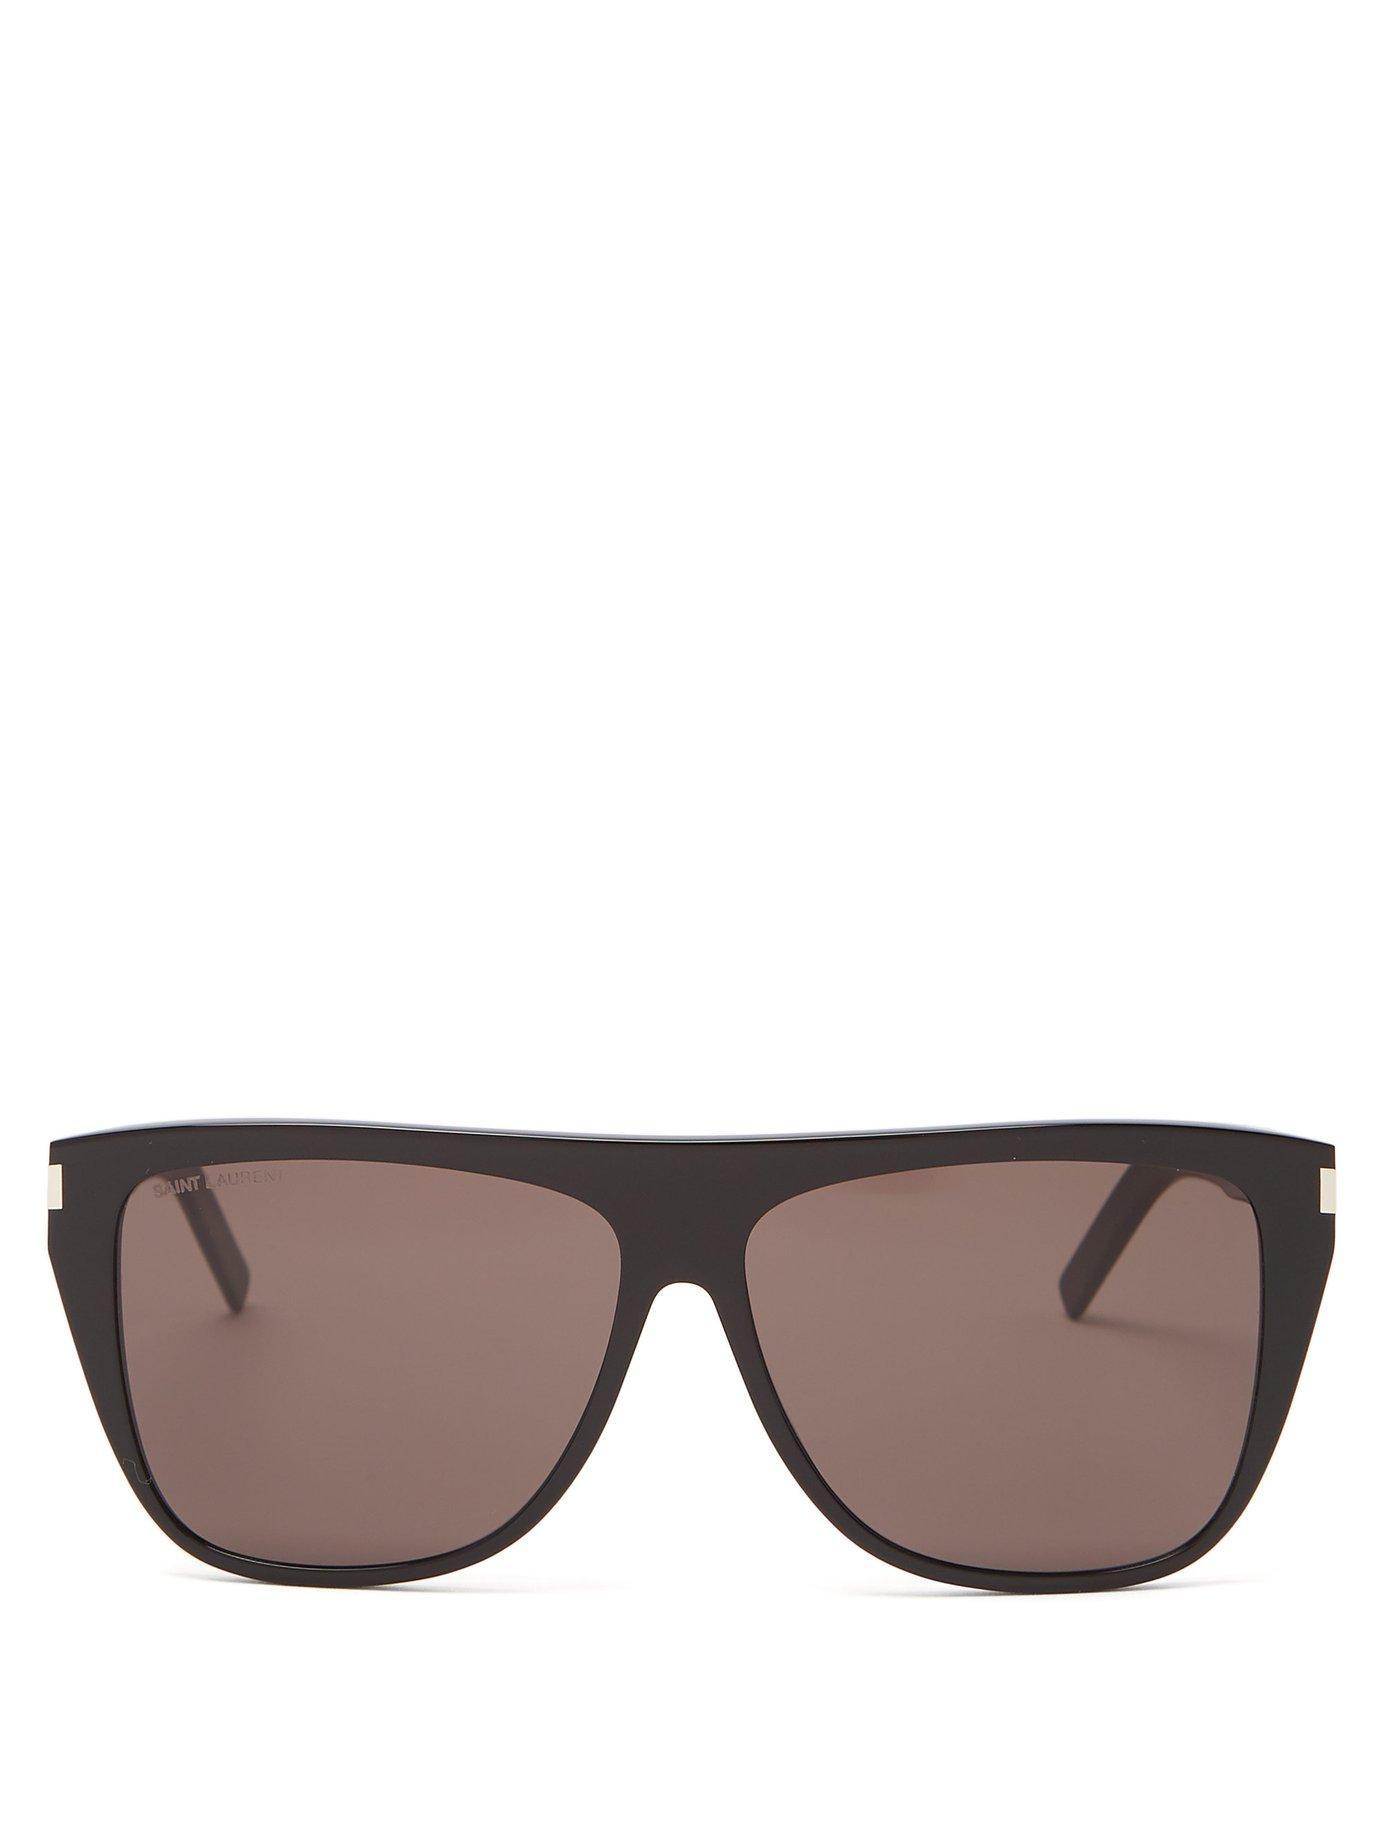 c35e25e6957dc Saint Laurent - Black Slim Flat Top D Frame Acetate Sunglasses - Lyst. View  fullscreen